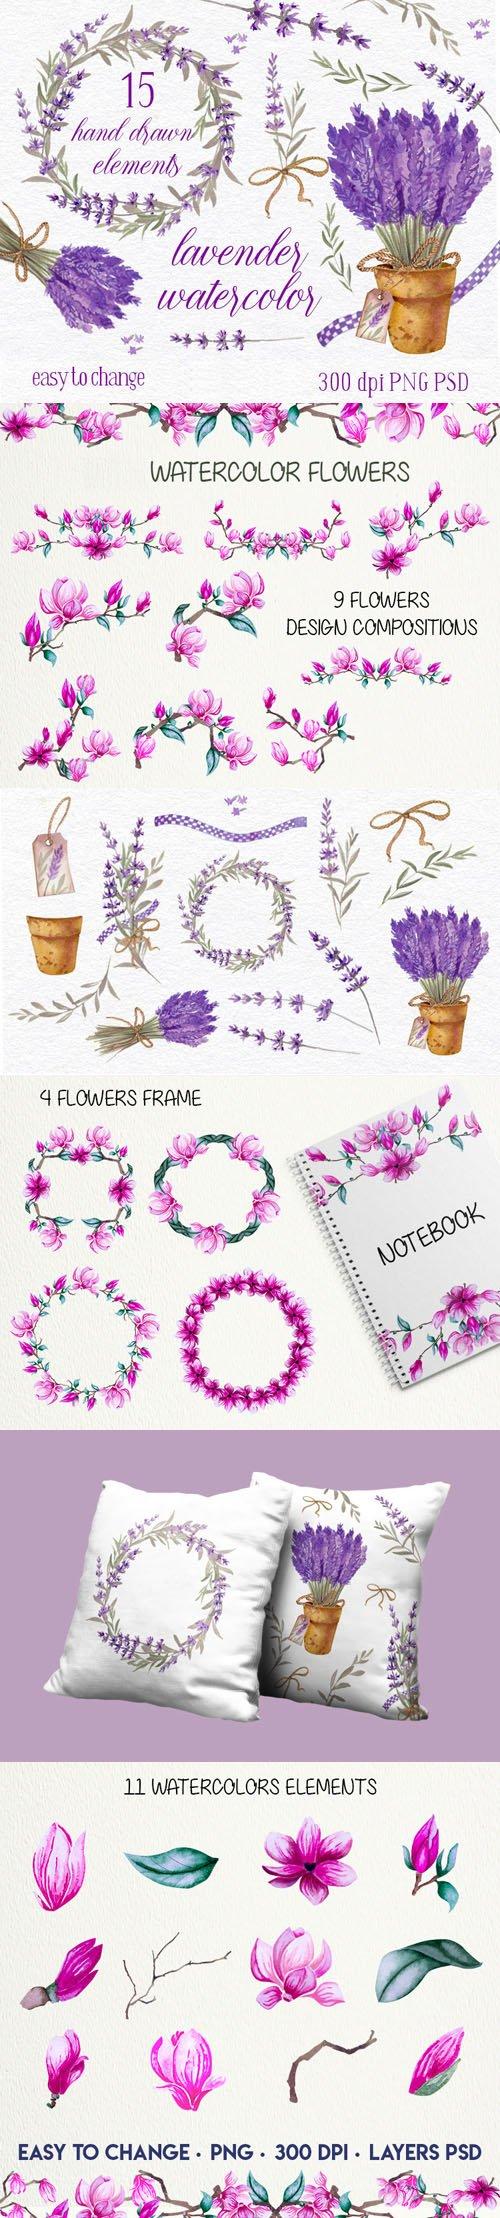 Lavender & Magnolia Watercolor Elements Collection